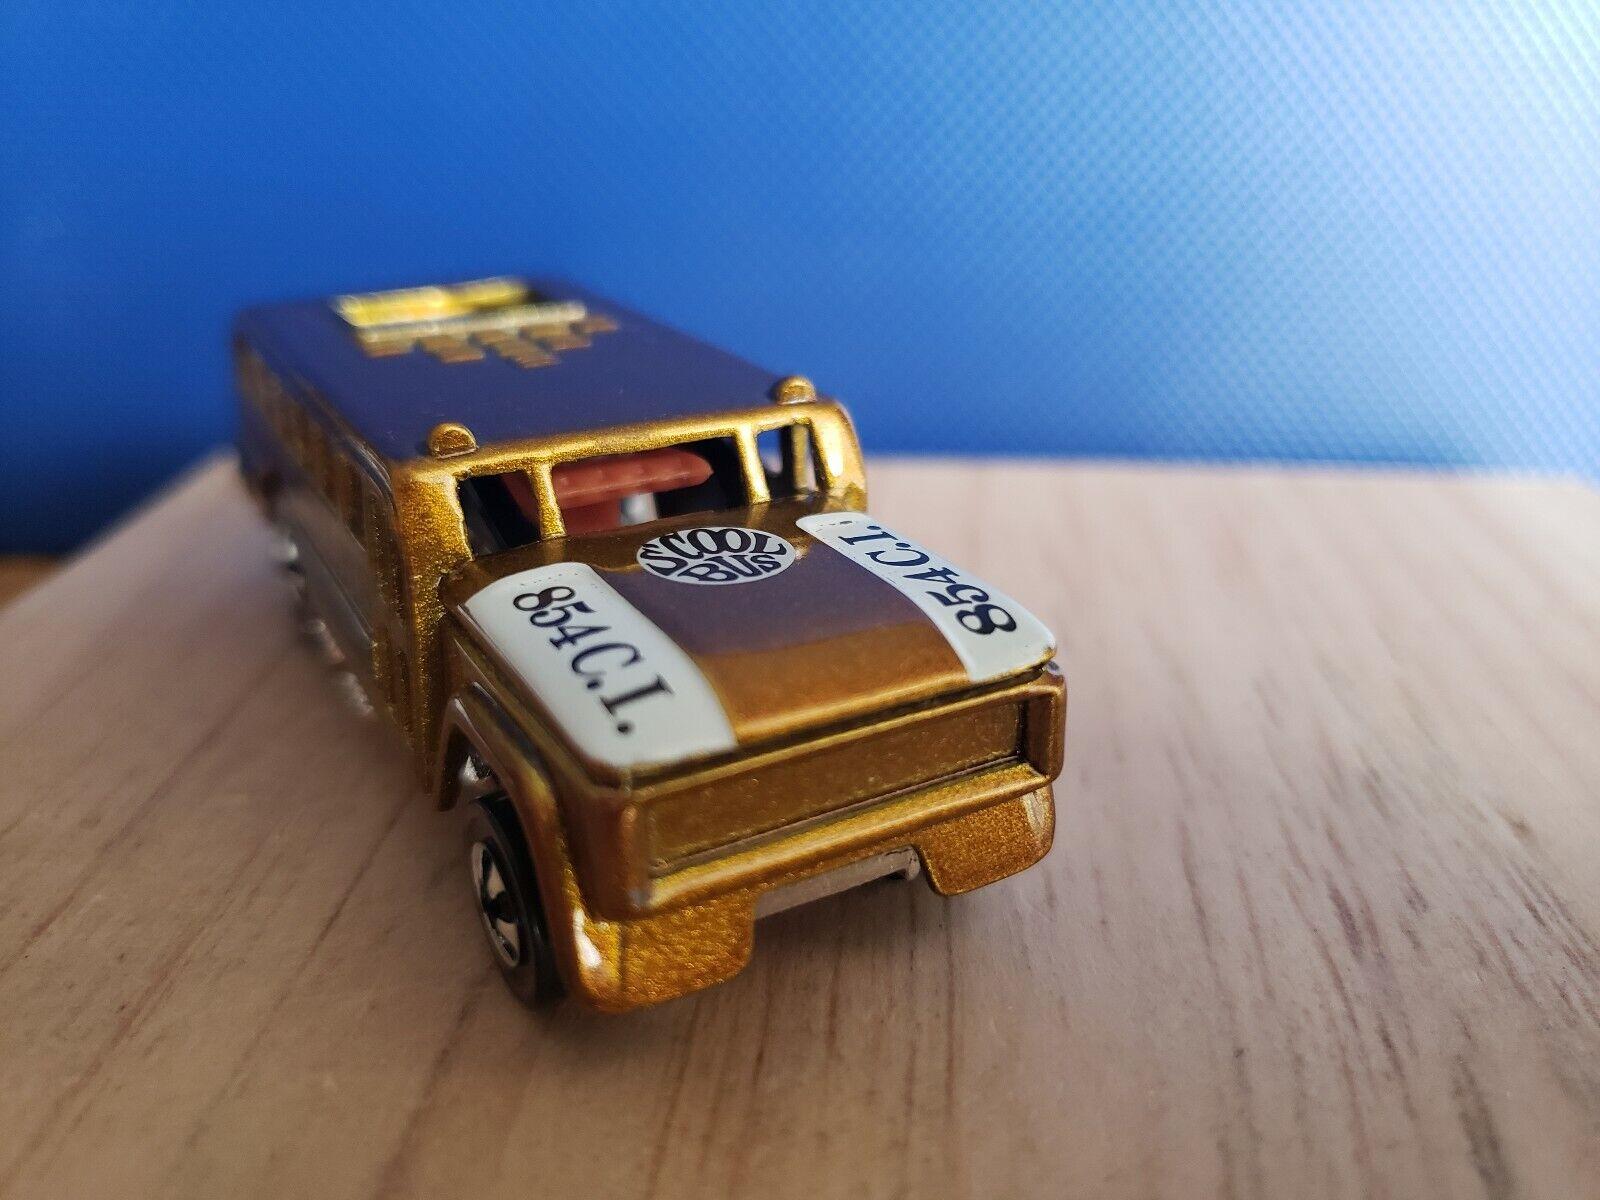 HOT WHEELS REDLINE METALLIC HONEY gold S'COOL BUS VINTAGE COLLECTION.